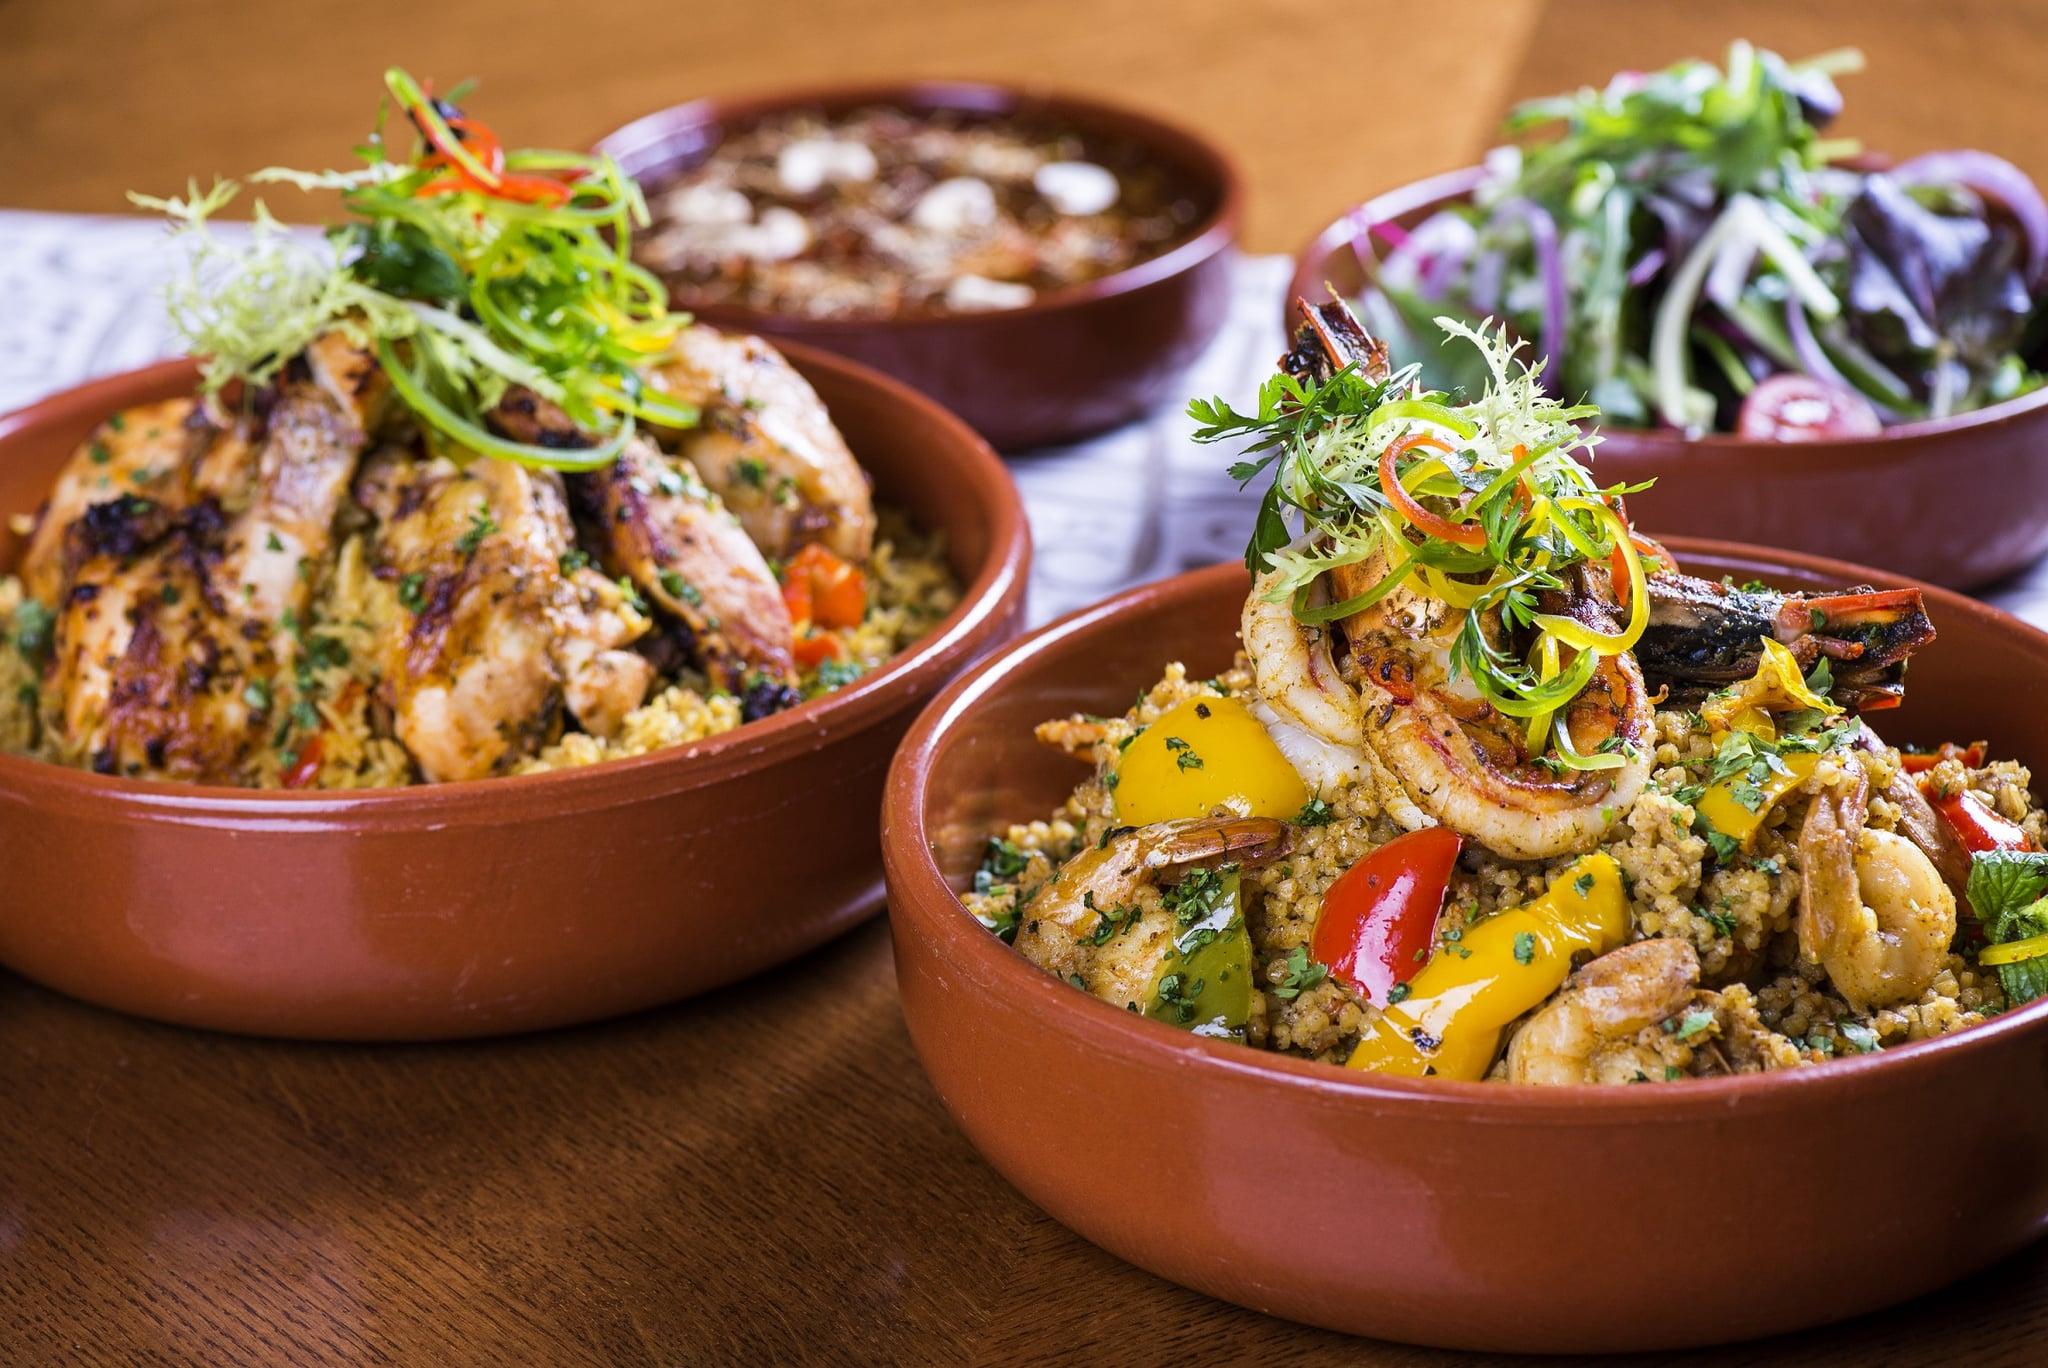 Shrimp jerish qatari style recipe popsugar middle east food share this link copy qatari food forumfinder Gallery